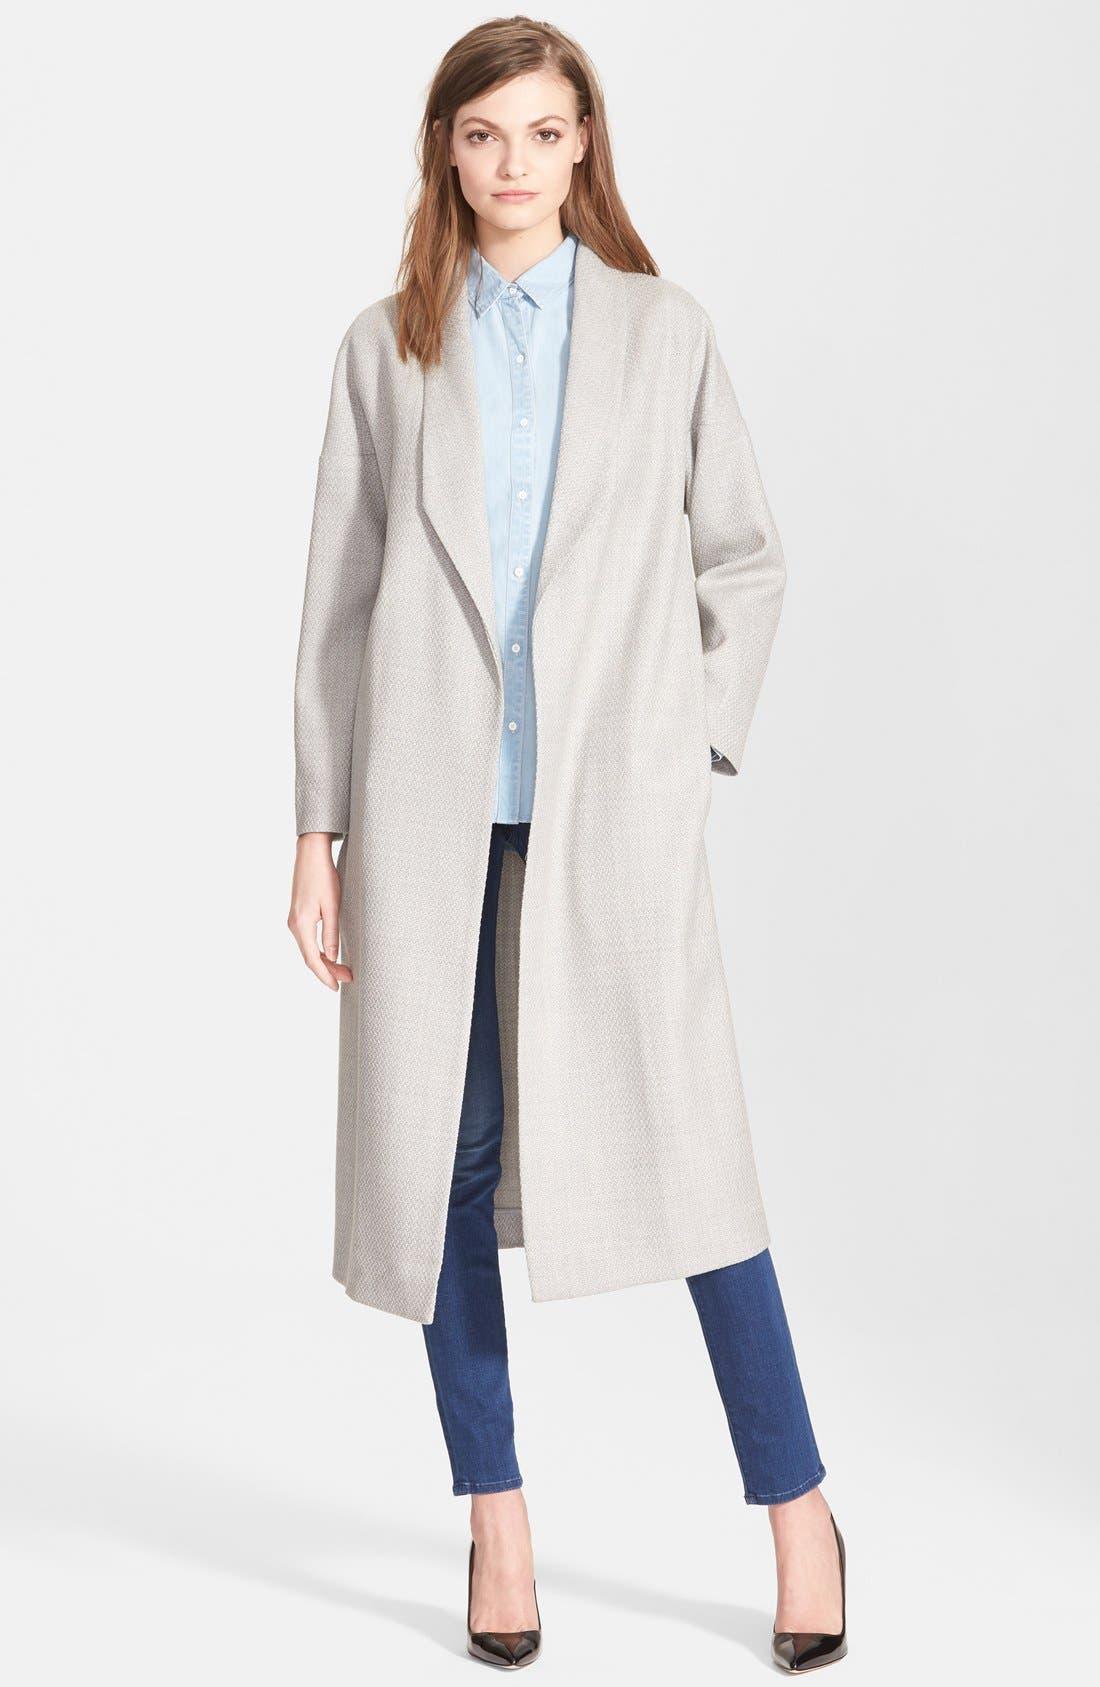 Alternate Image 1 Selected - AYR 'The Robe' Wool Coat